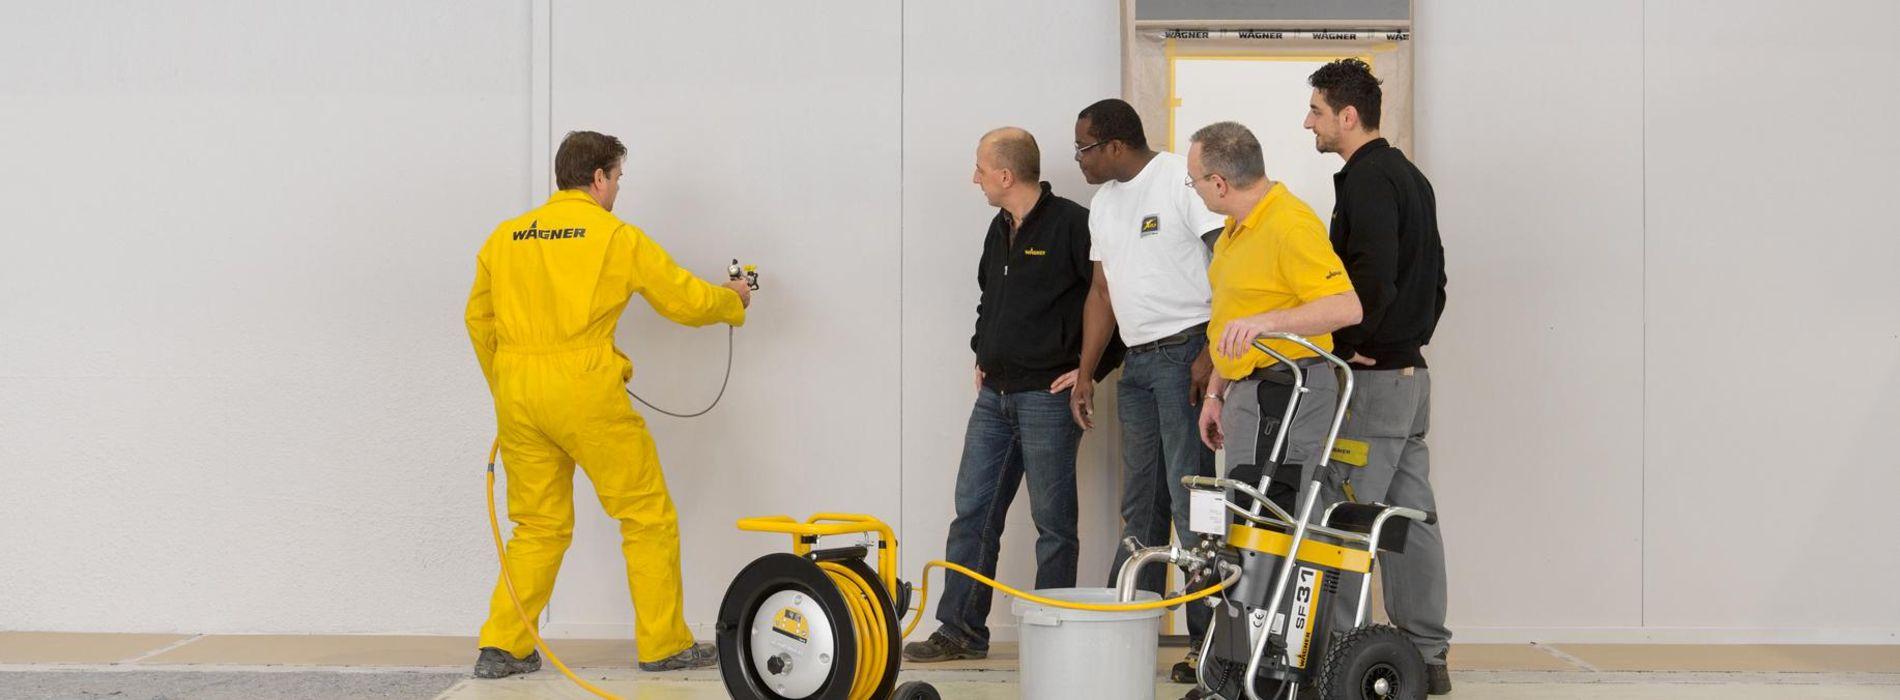 Contractor trainings